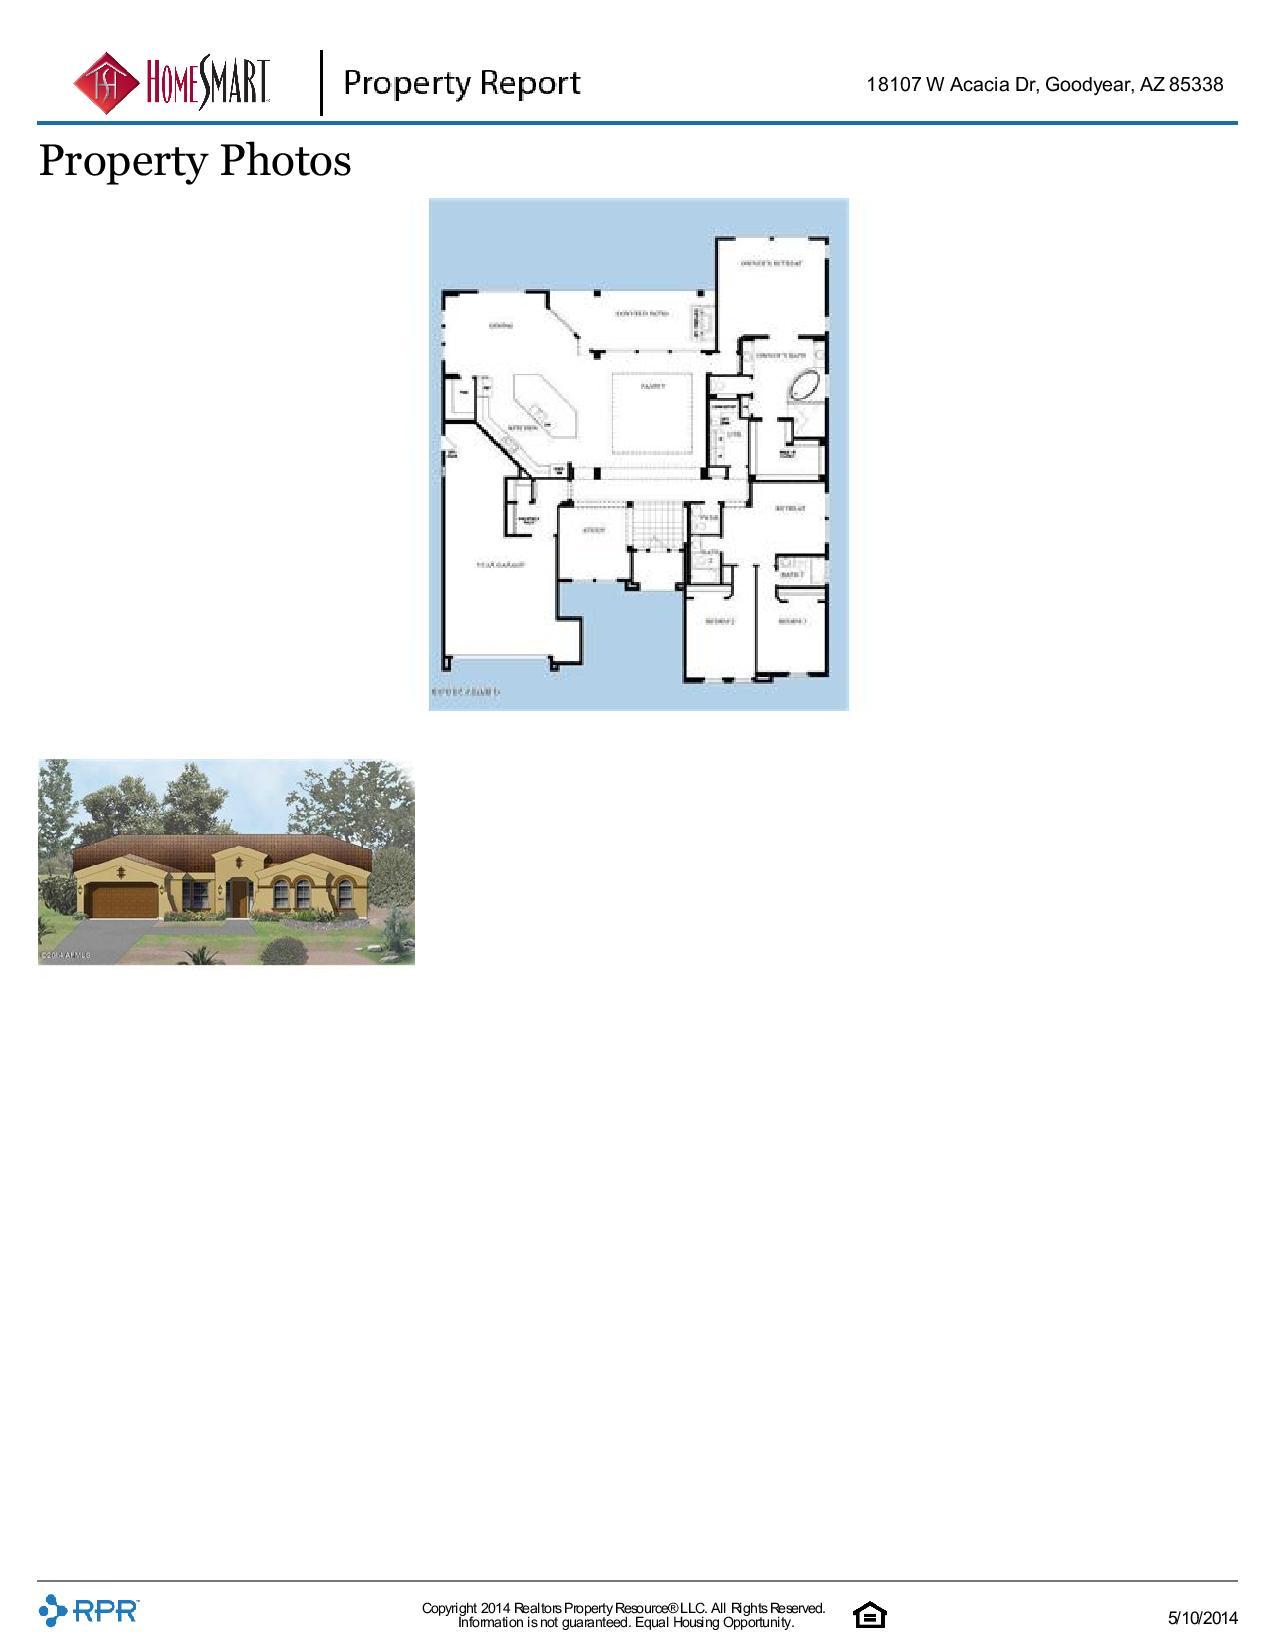 18107-W-Acacia-Dr-Goodyear-AZ-85338-page-005